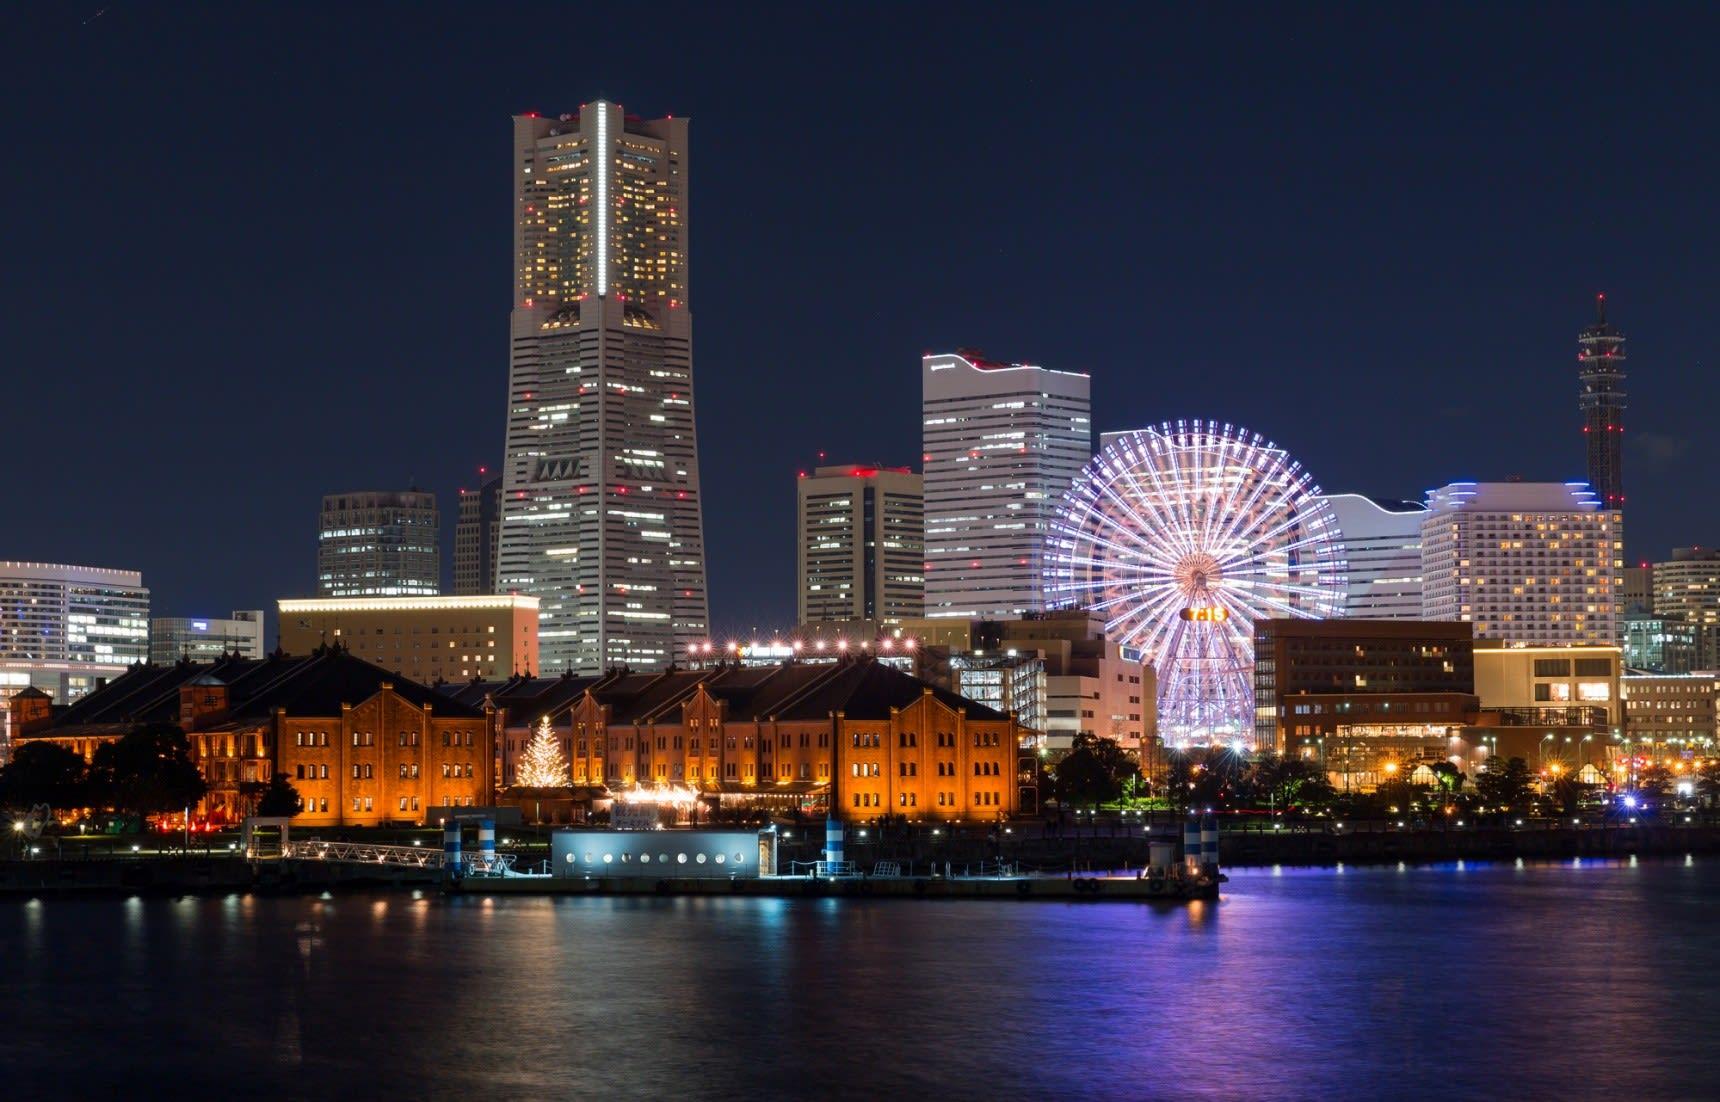 橫濱夜景。|來源:allabout-japan.com